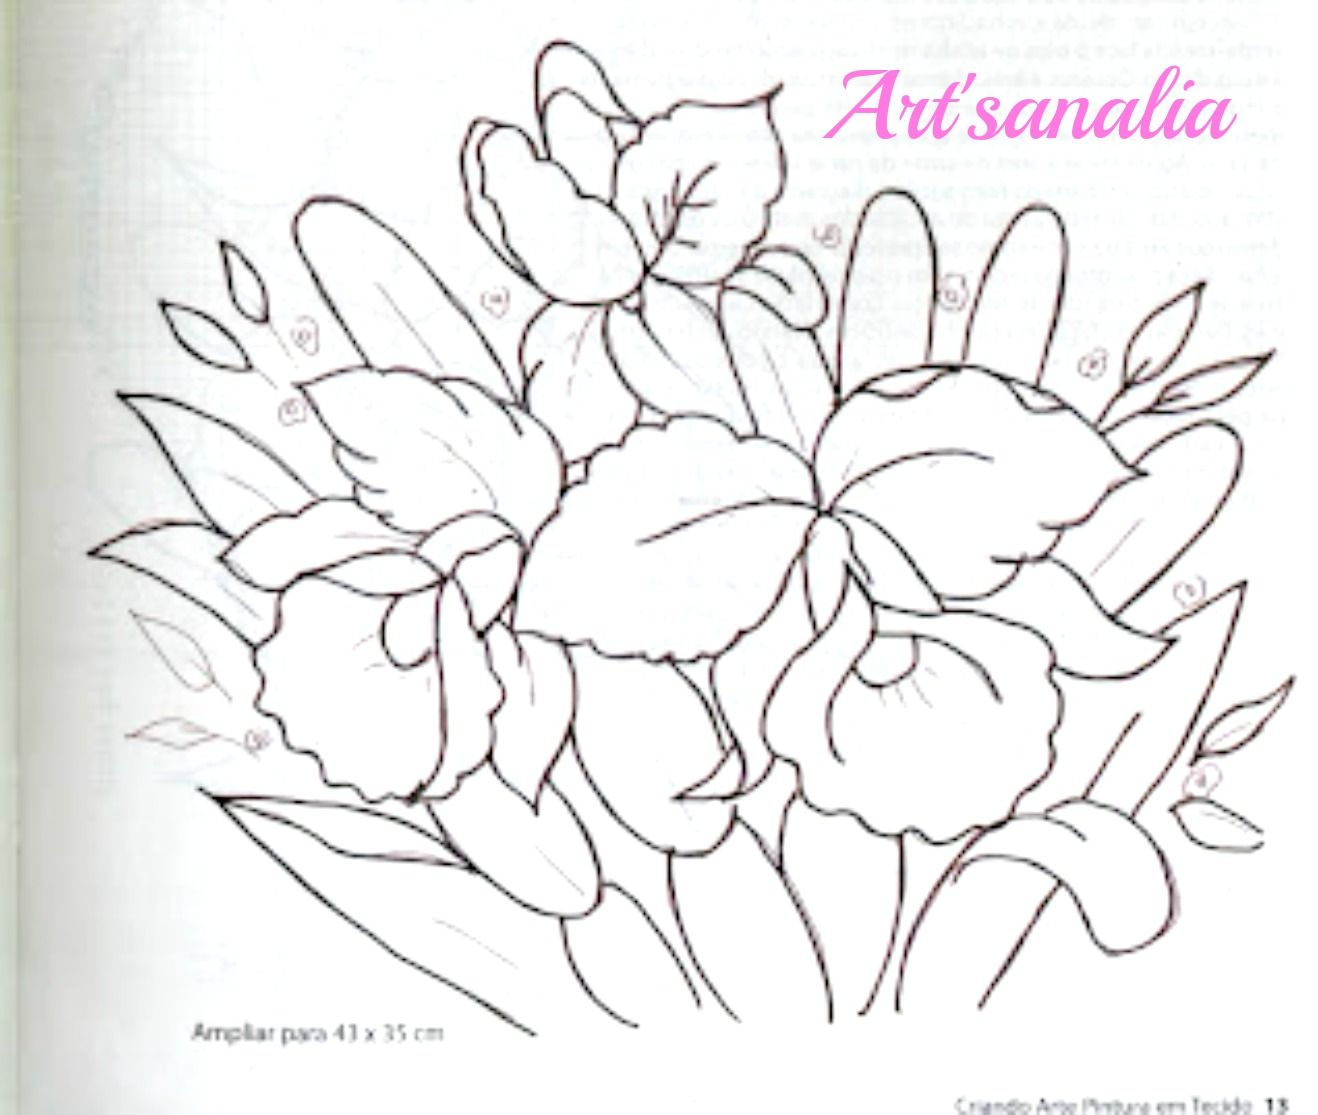 00000008.JPG (1318×1115) | Manualidades | Pinterest | Pintar y Pinturas